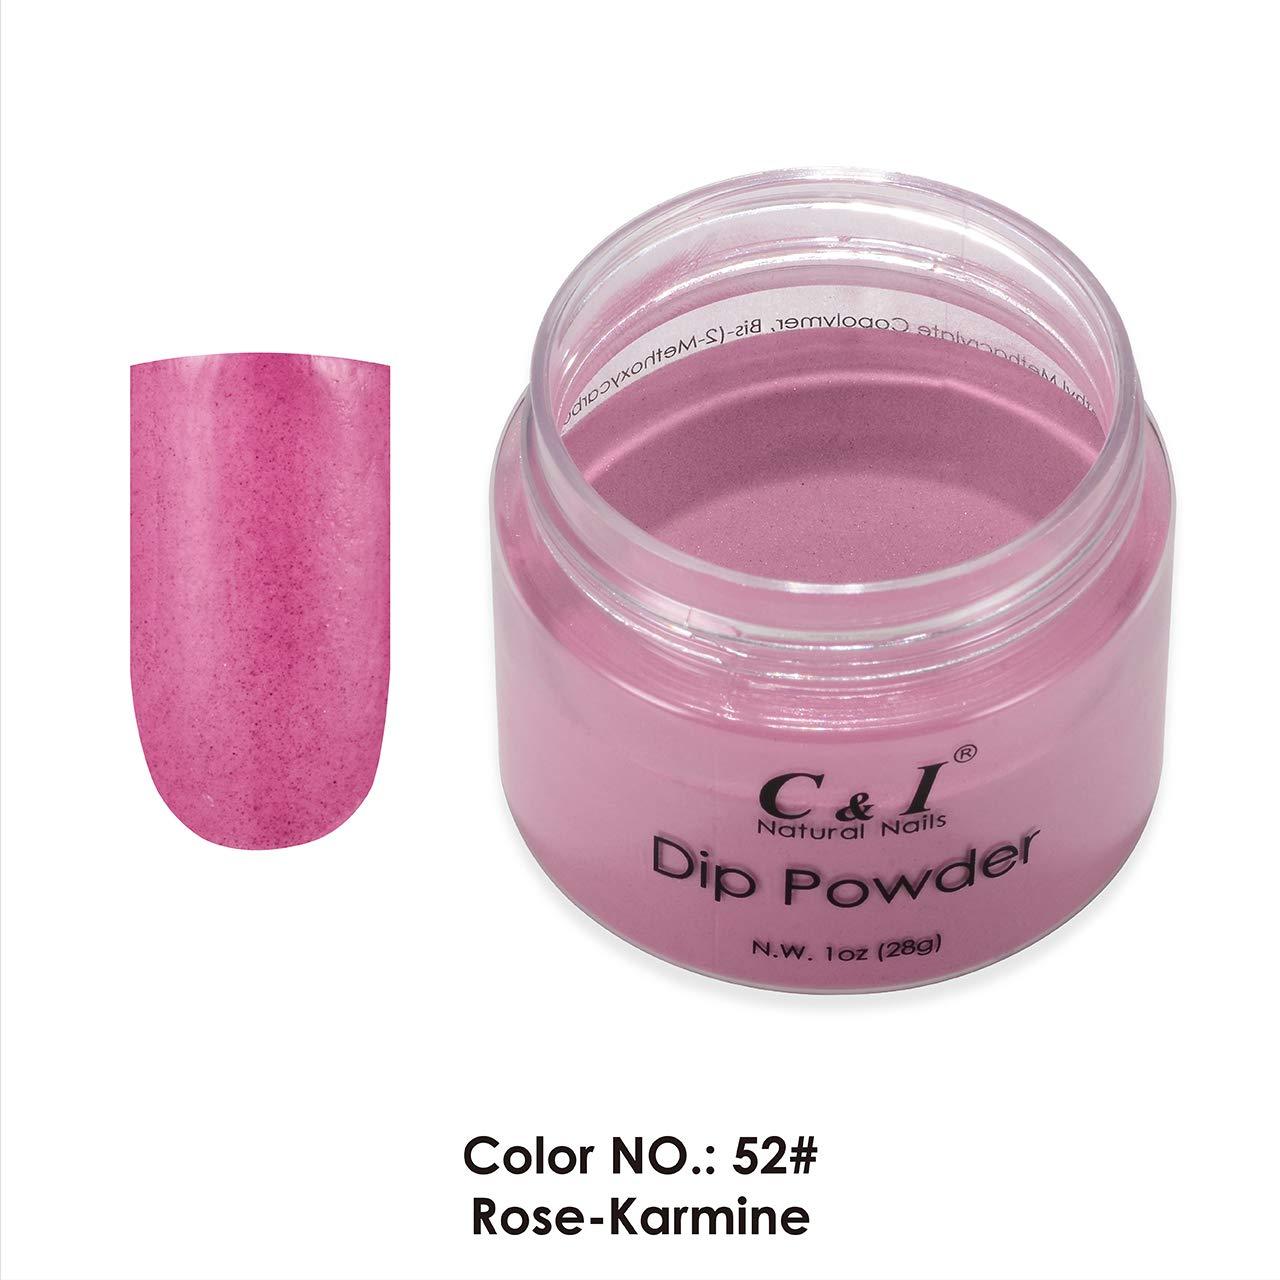 C & I Dip Powder Color No.052 Rose-Karmine Red Color System